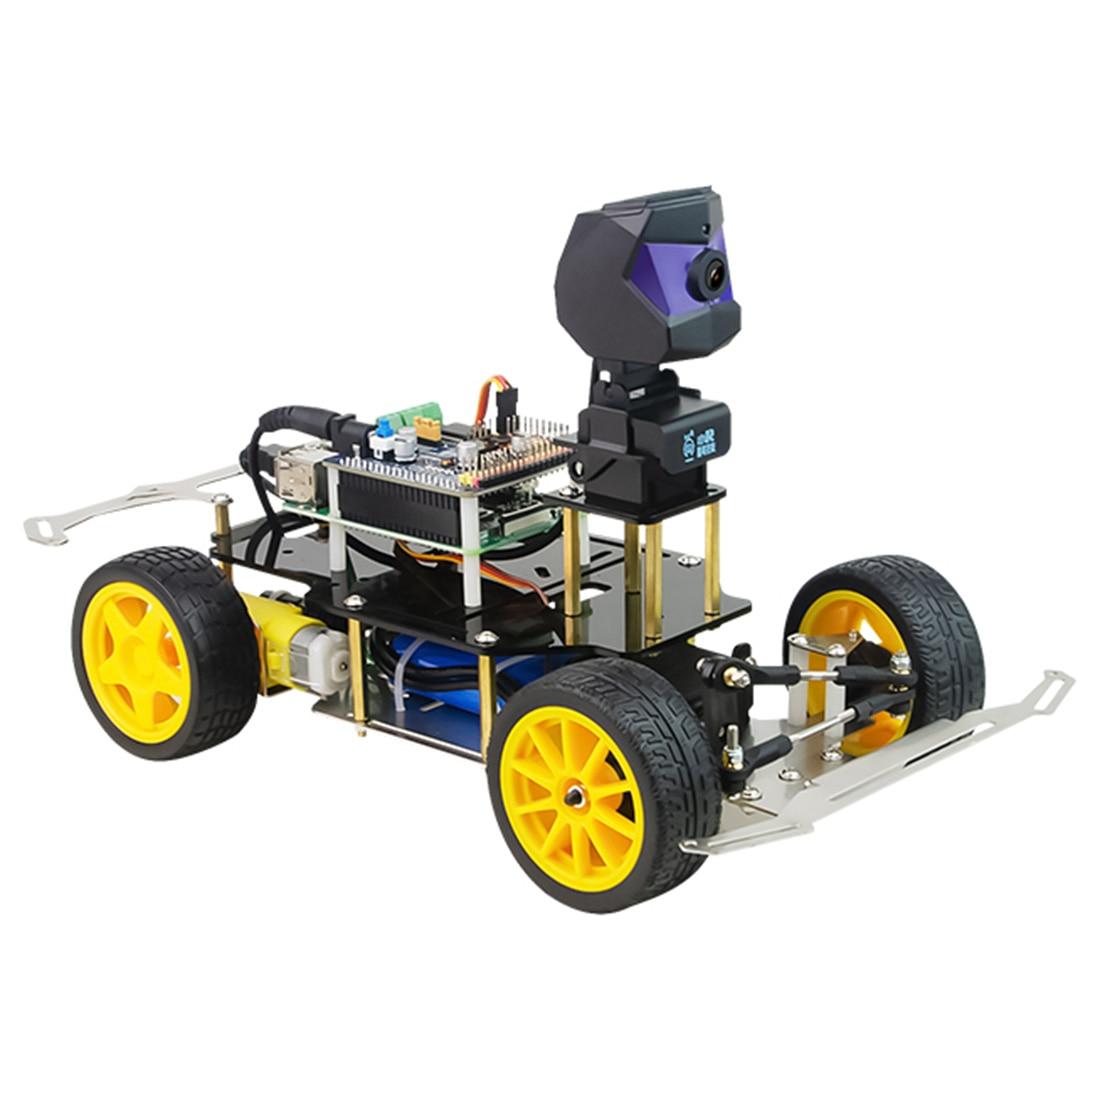 Donkey Car Smart AI Line Follower Programmable Robot Opensource DIY Self Driving Platform For Raspberry Pi RC Car